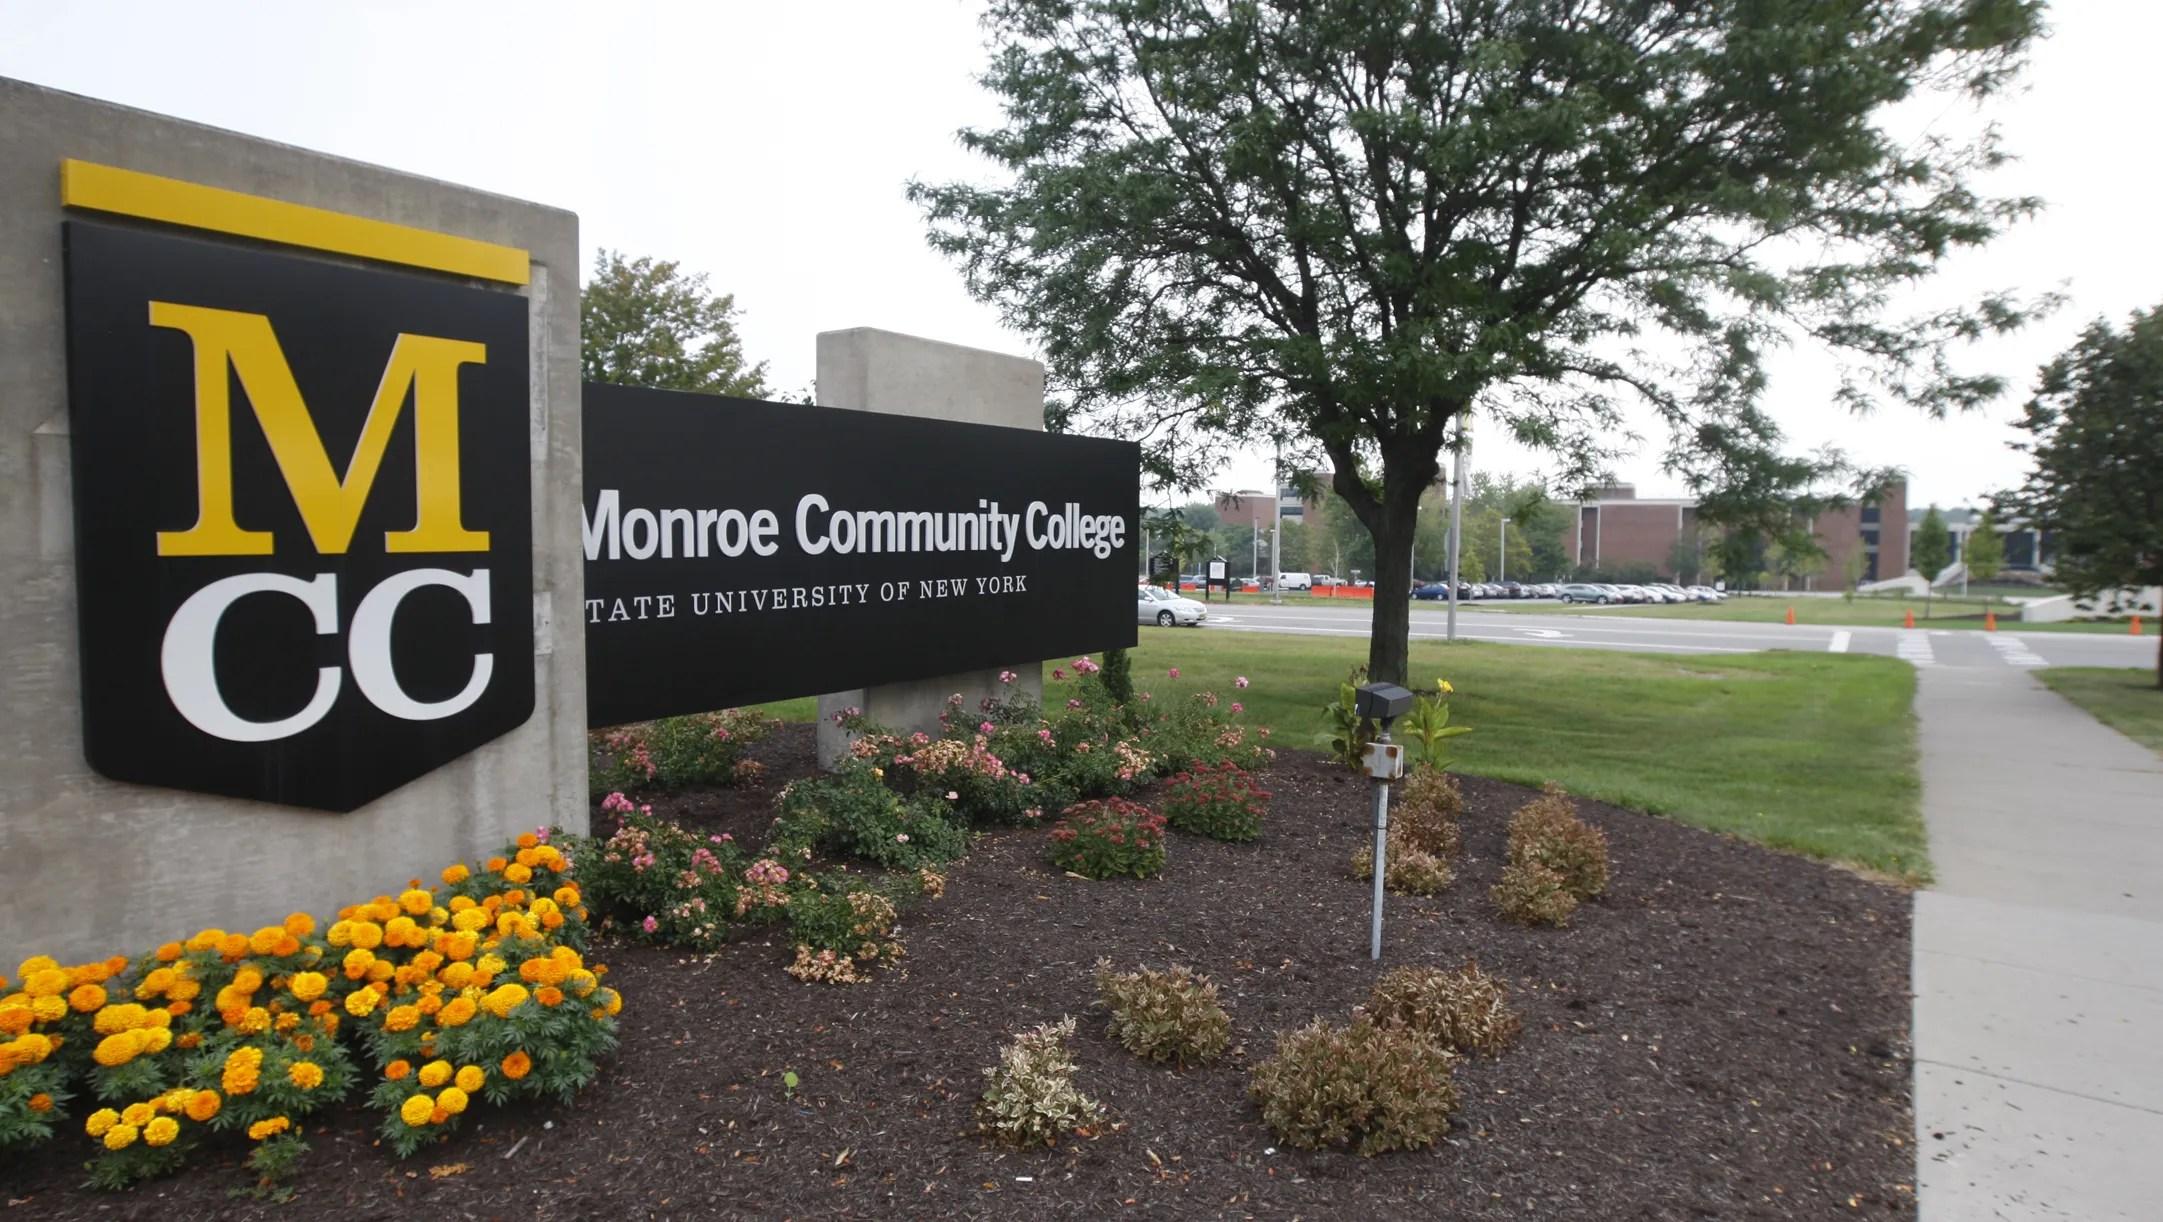 Monroe Community College responds to tweet's racial slur